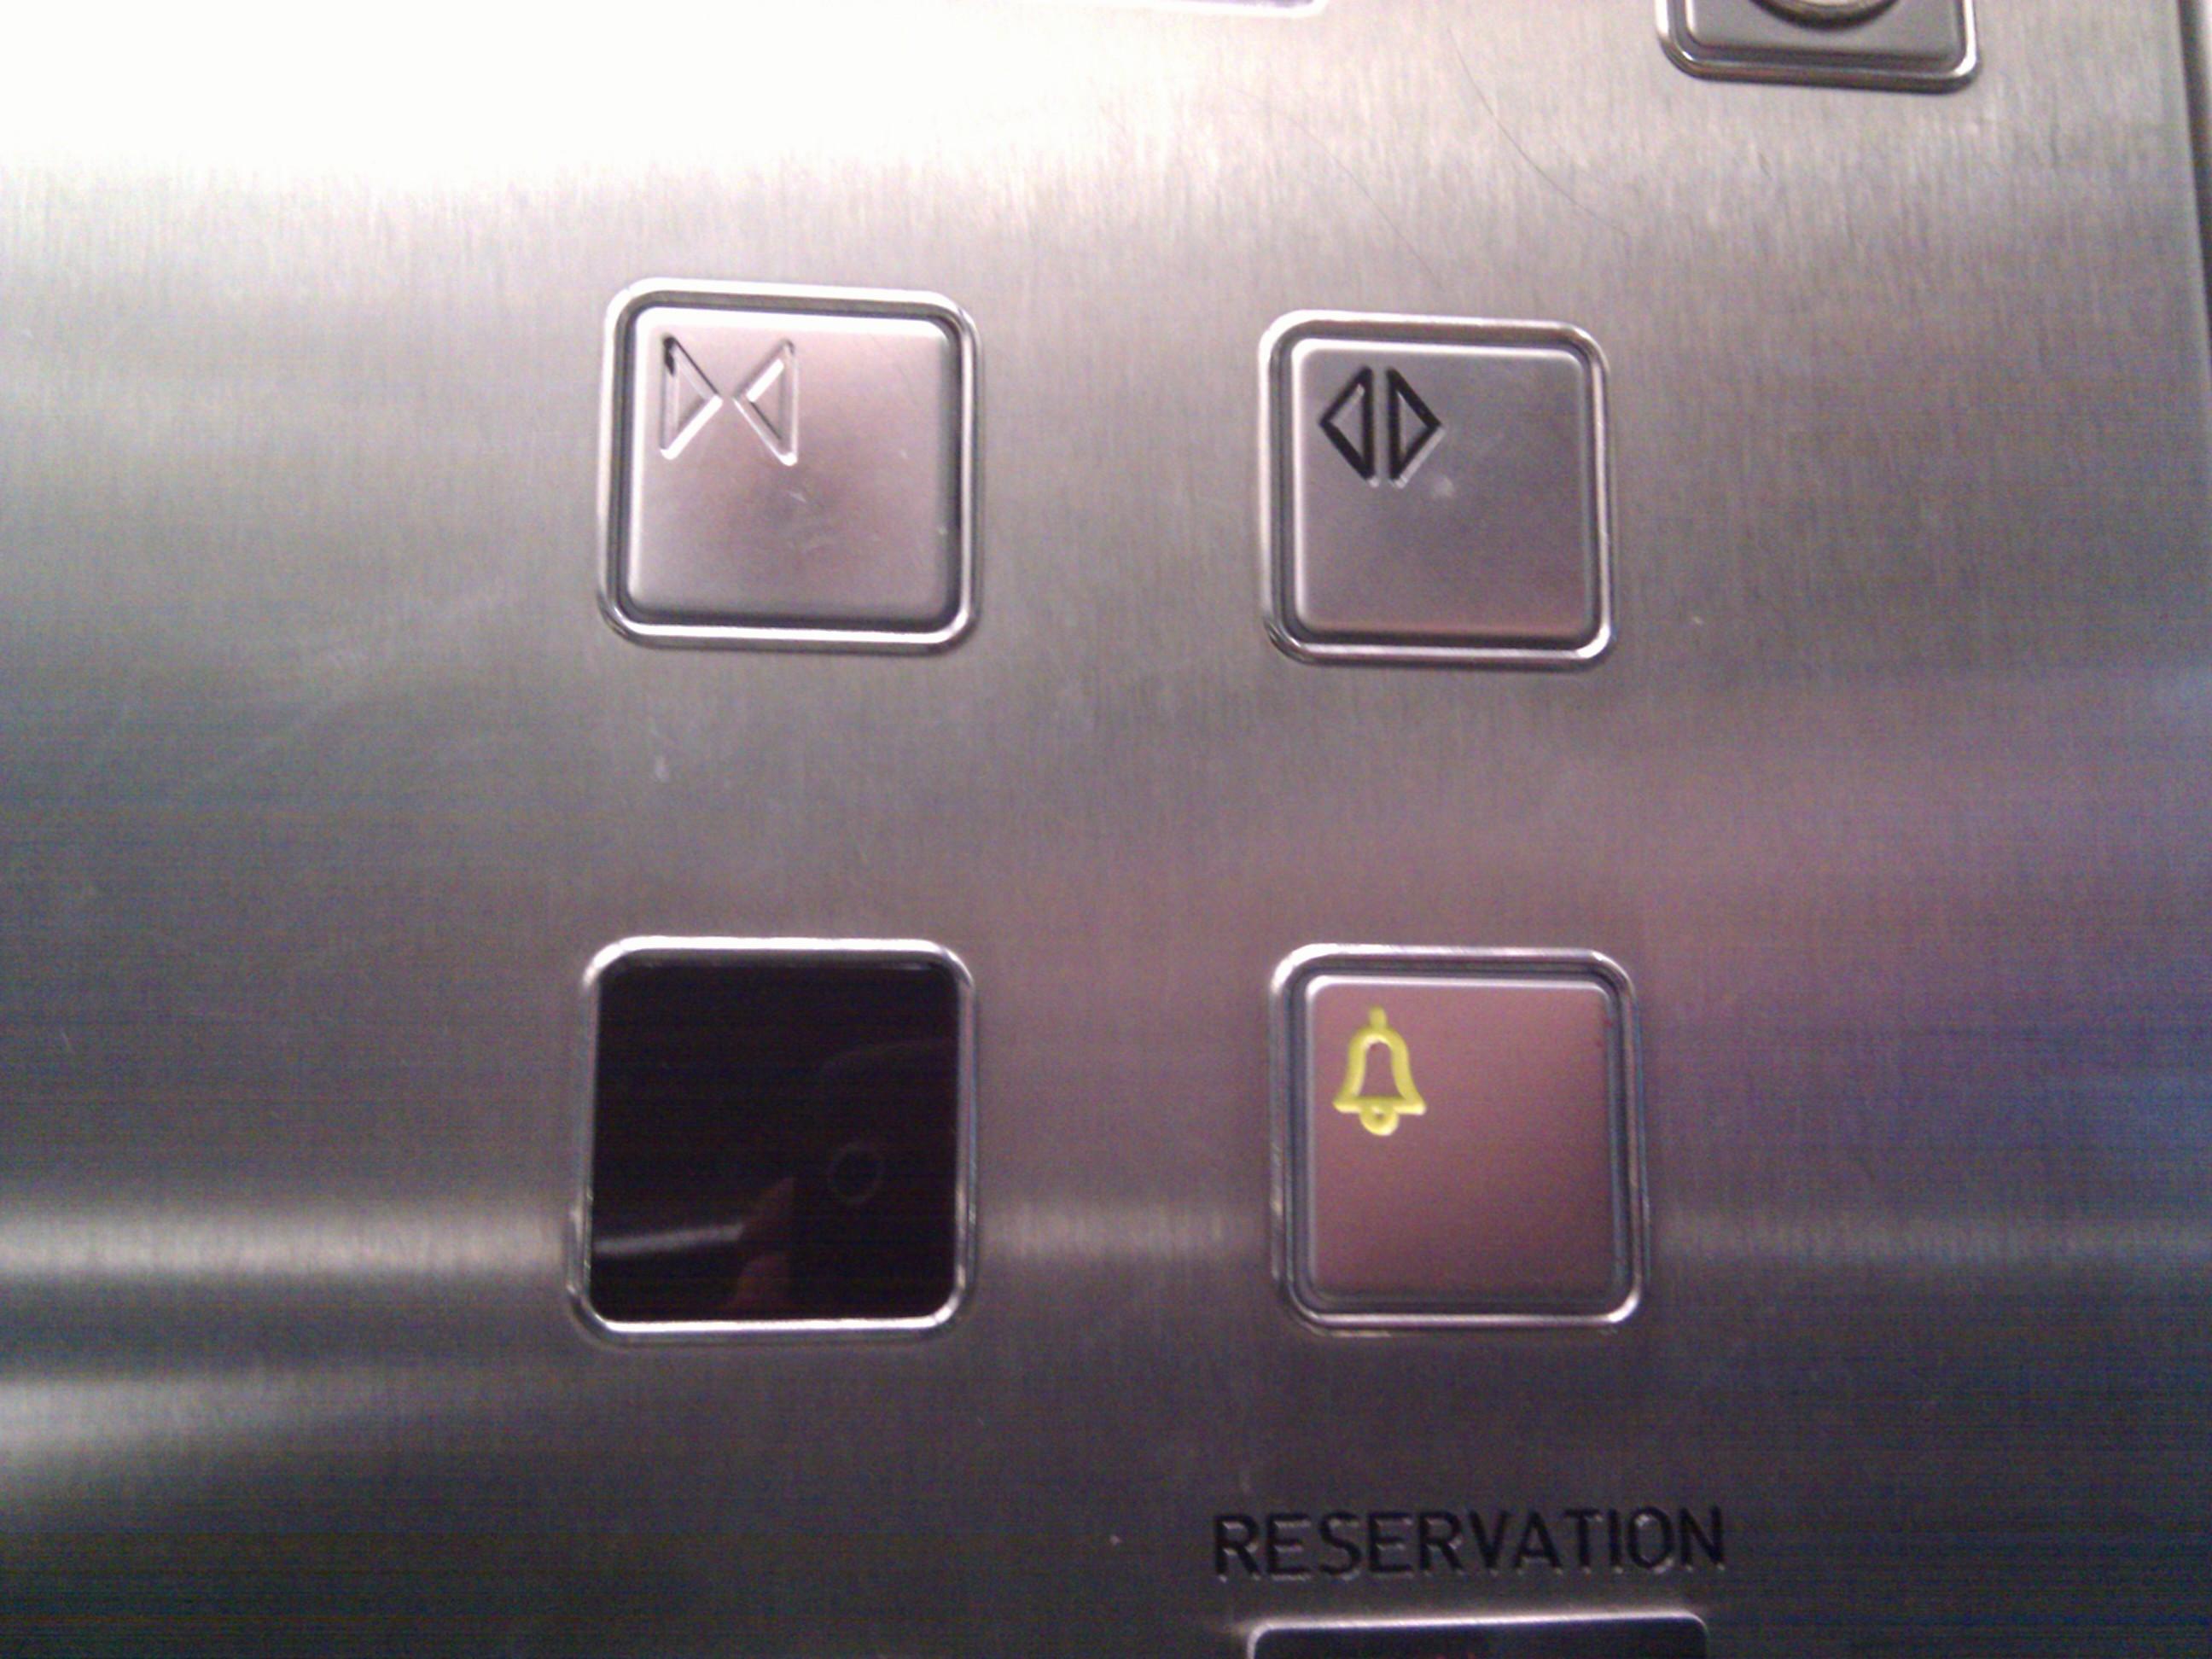 Das Fahrstuhlknopf-Orakel